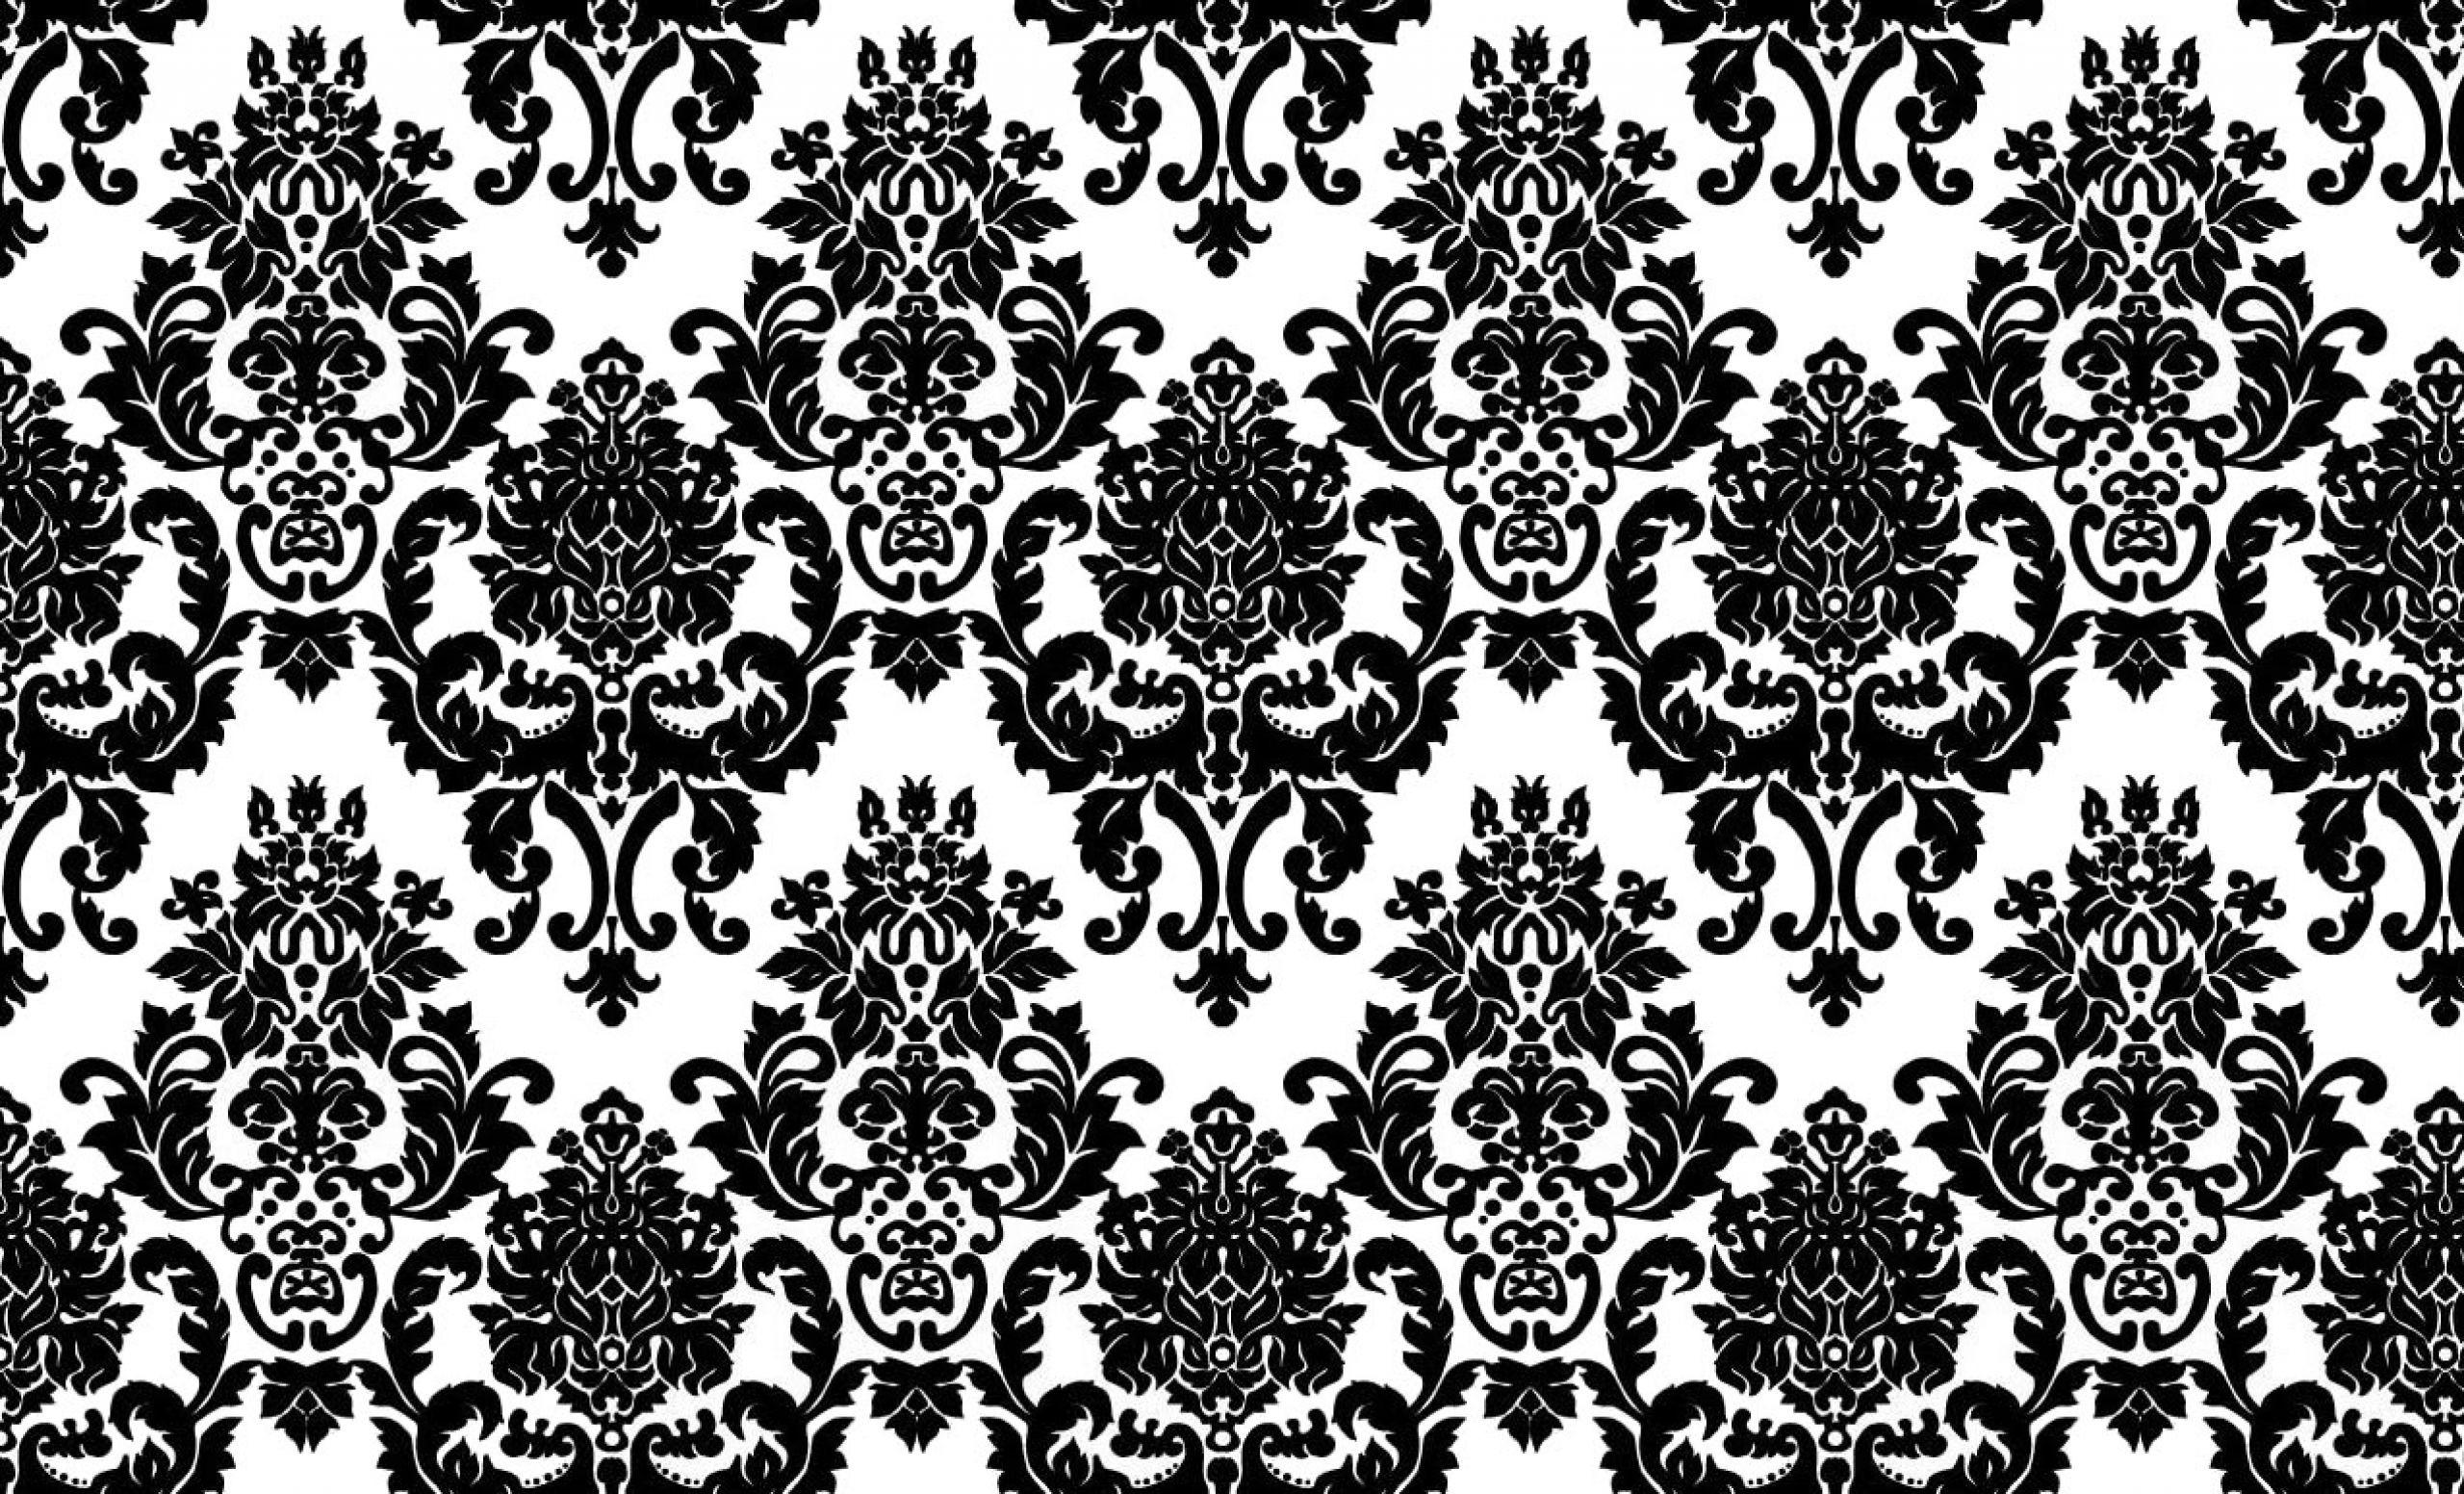 2560x1552, New White And Black Pattern Wallpaper The - Damask Desktop Background  Hd - 2560x1552 Wallpaper - Teahub.io